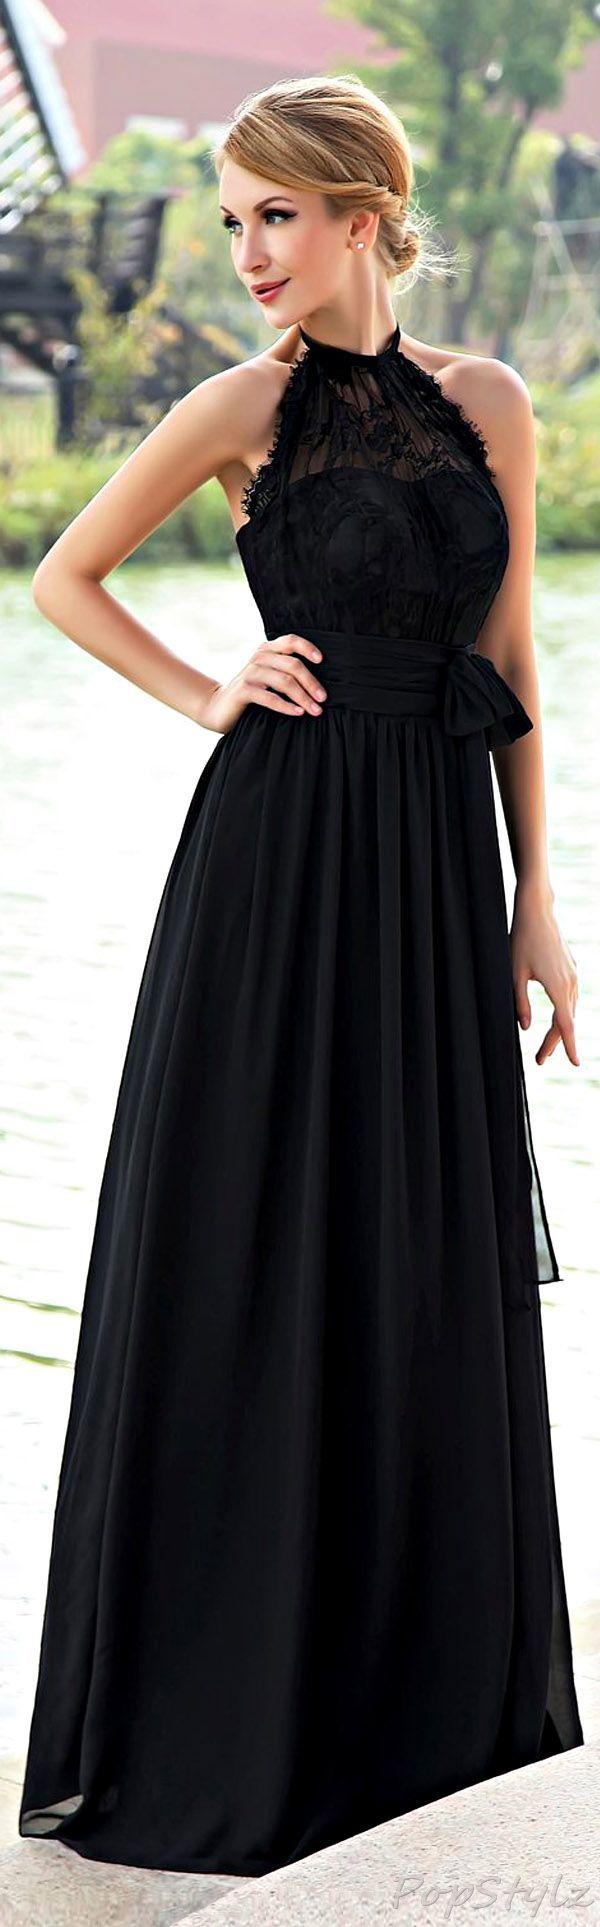 118 best Dress to Impress images on Pinterest | Party wear dresses ...